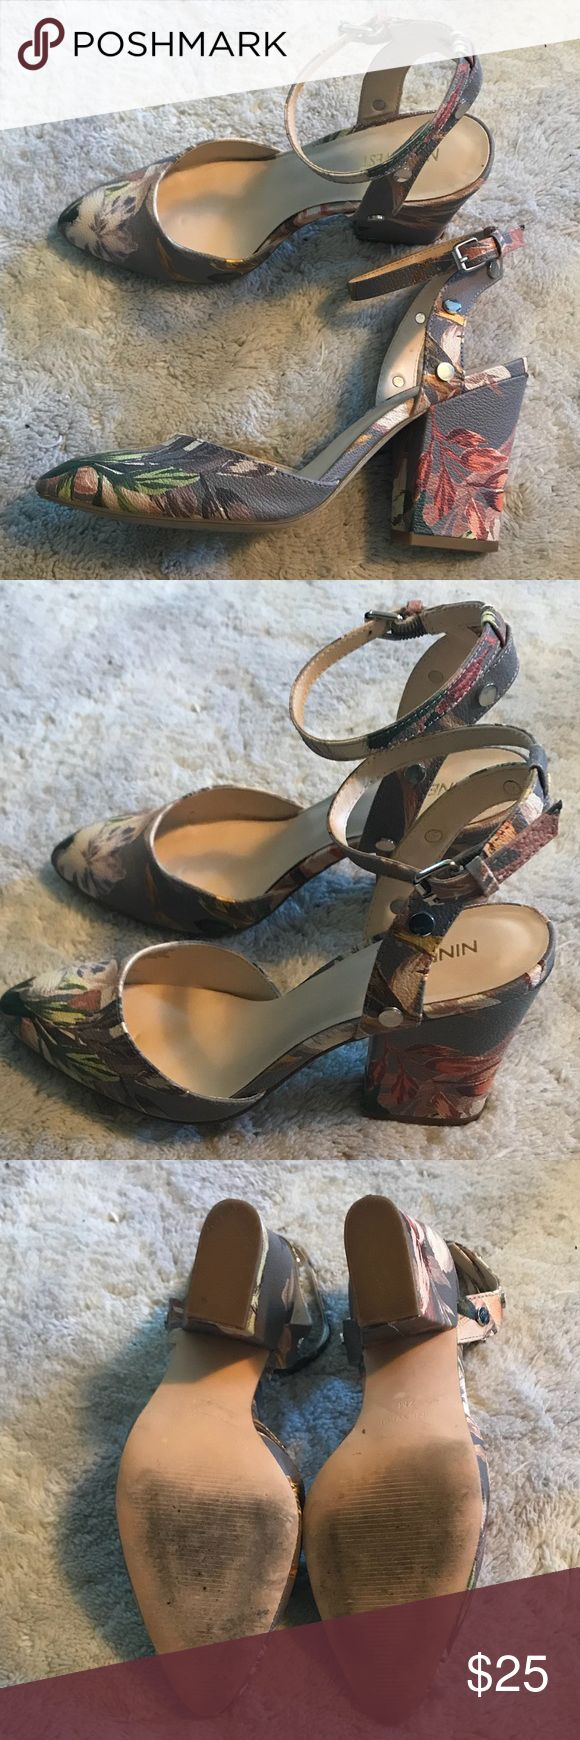 Nine West Grey Spring 3 Inch Heels Size 7 Gently worn, Nine West Grey Spring 3 Inch Heels with Ankle Strap. Size 7. Nine West Shoes Heels